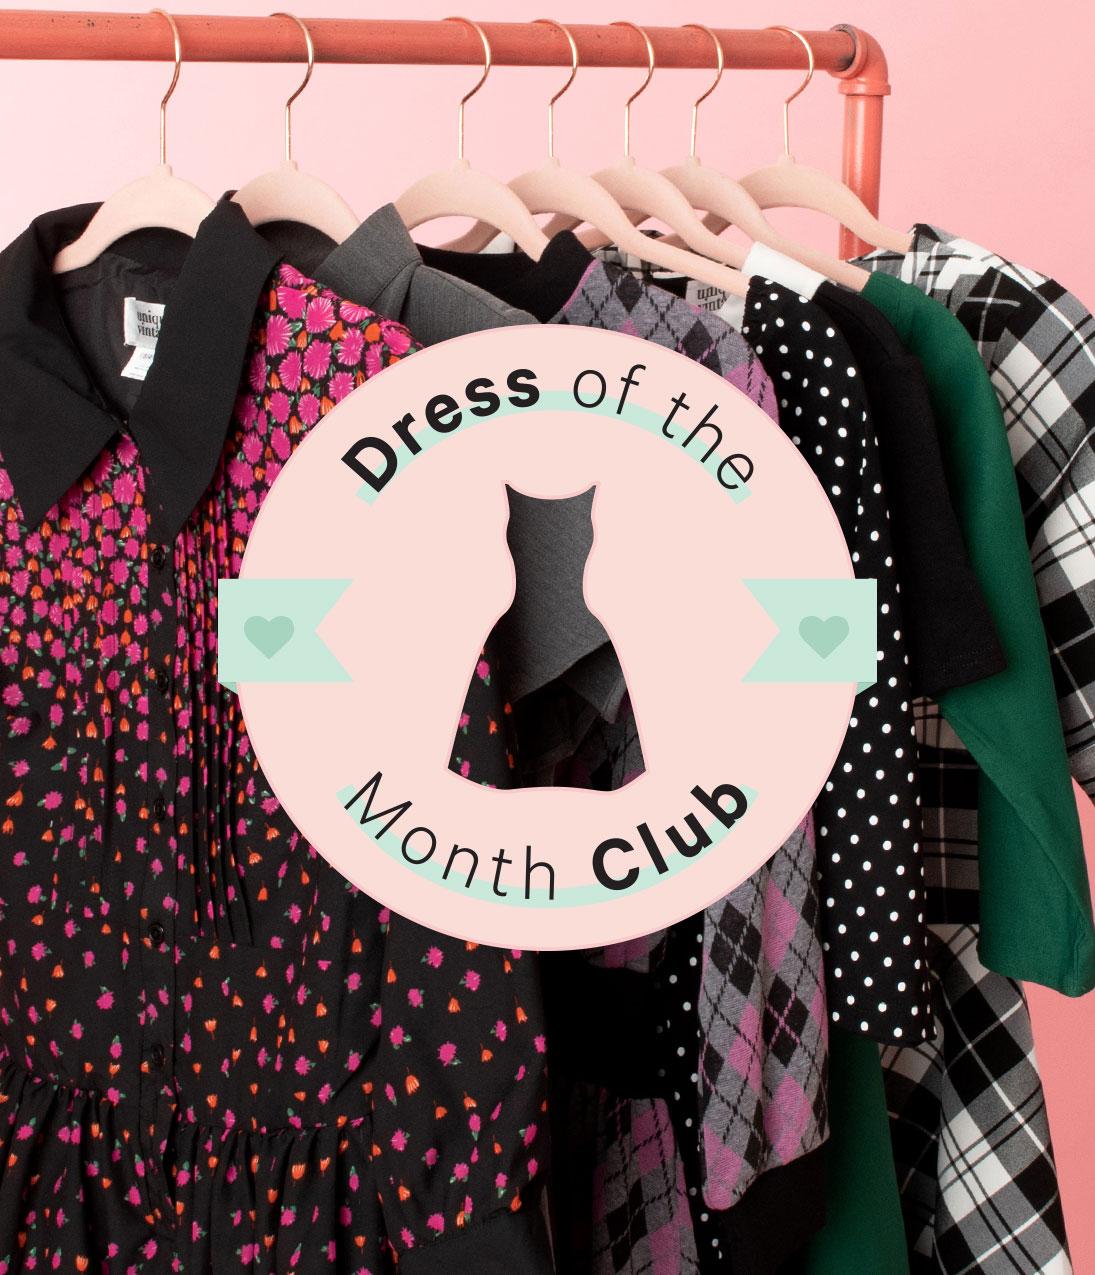 Dress of the Month Club Membership